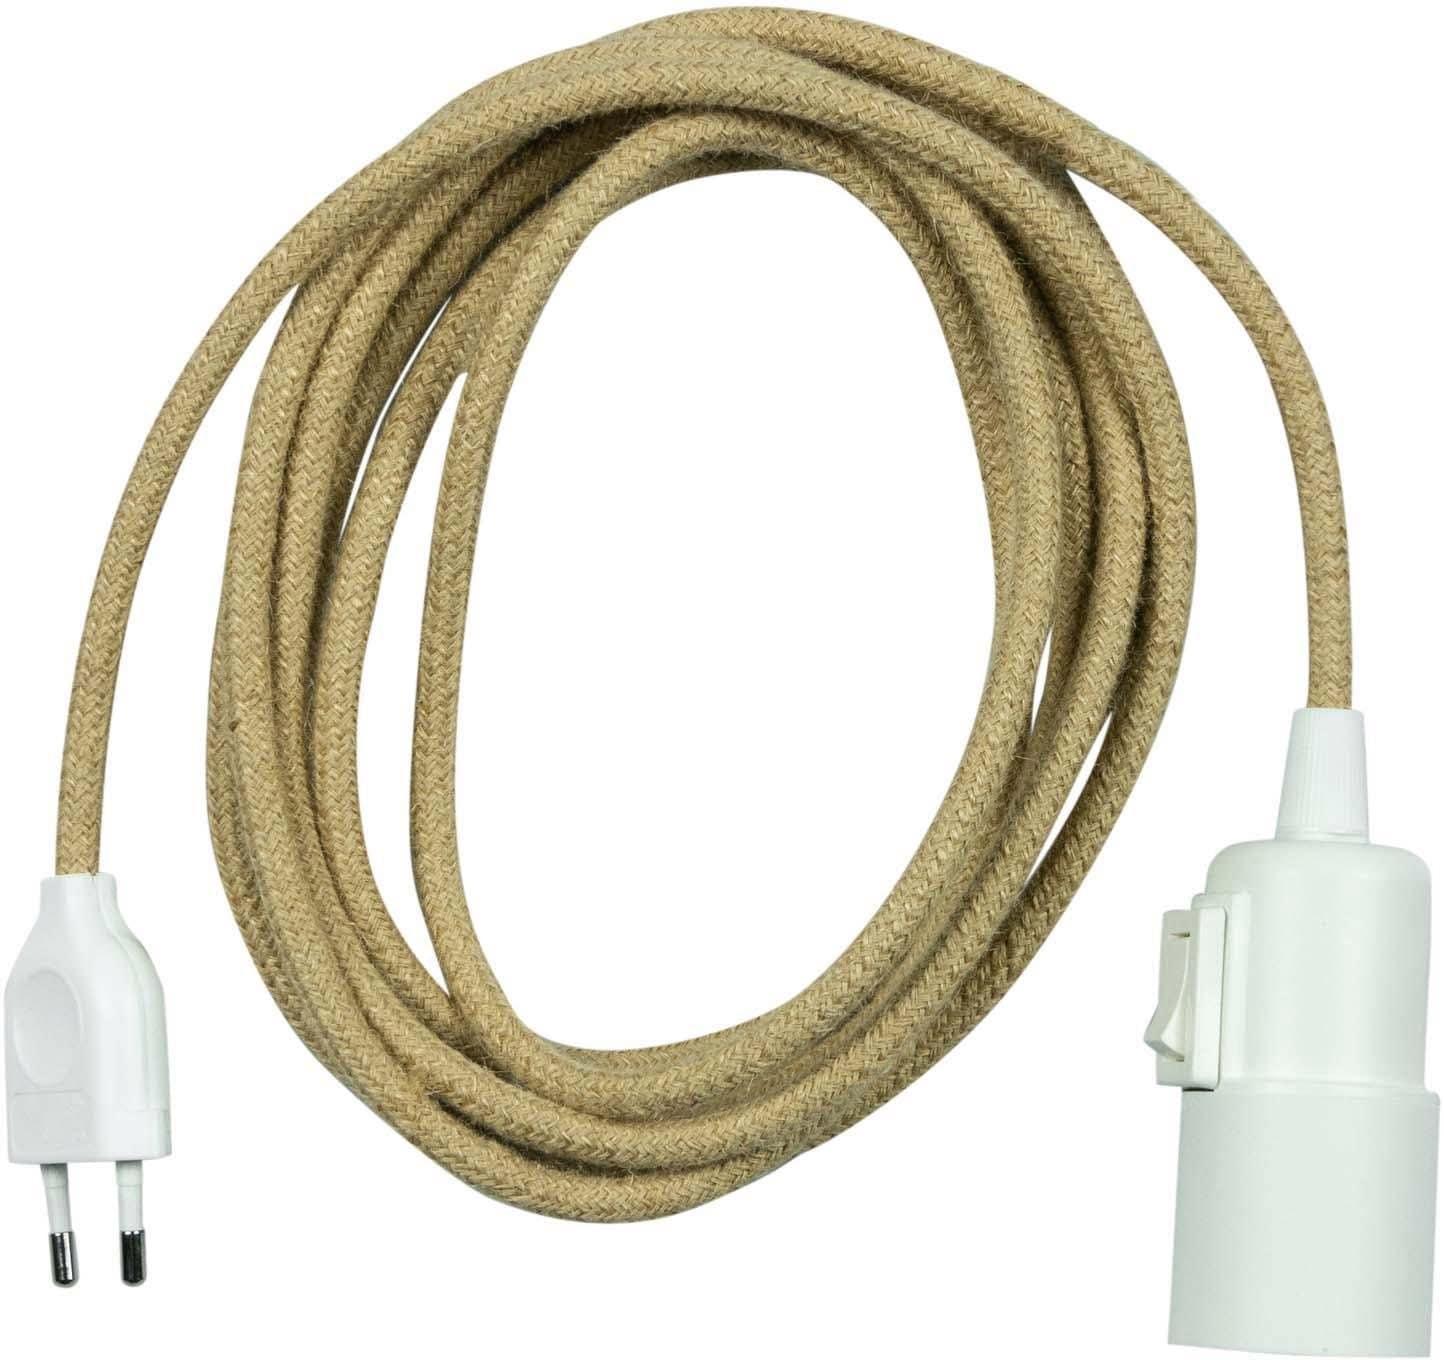 SEGULA,Pendelleuchte Pendelleuchte Weiß - schalter Kunststoff - 3m Jute Kabel